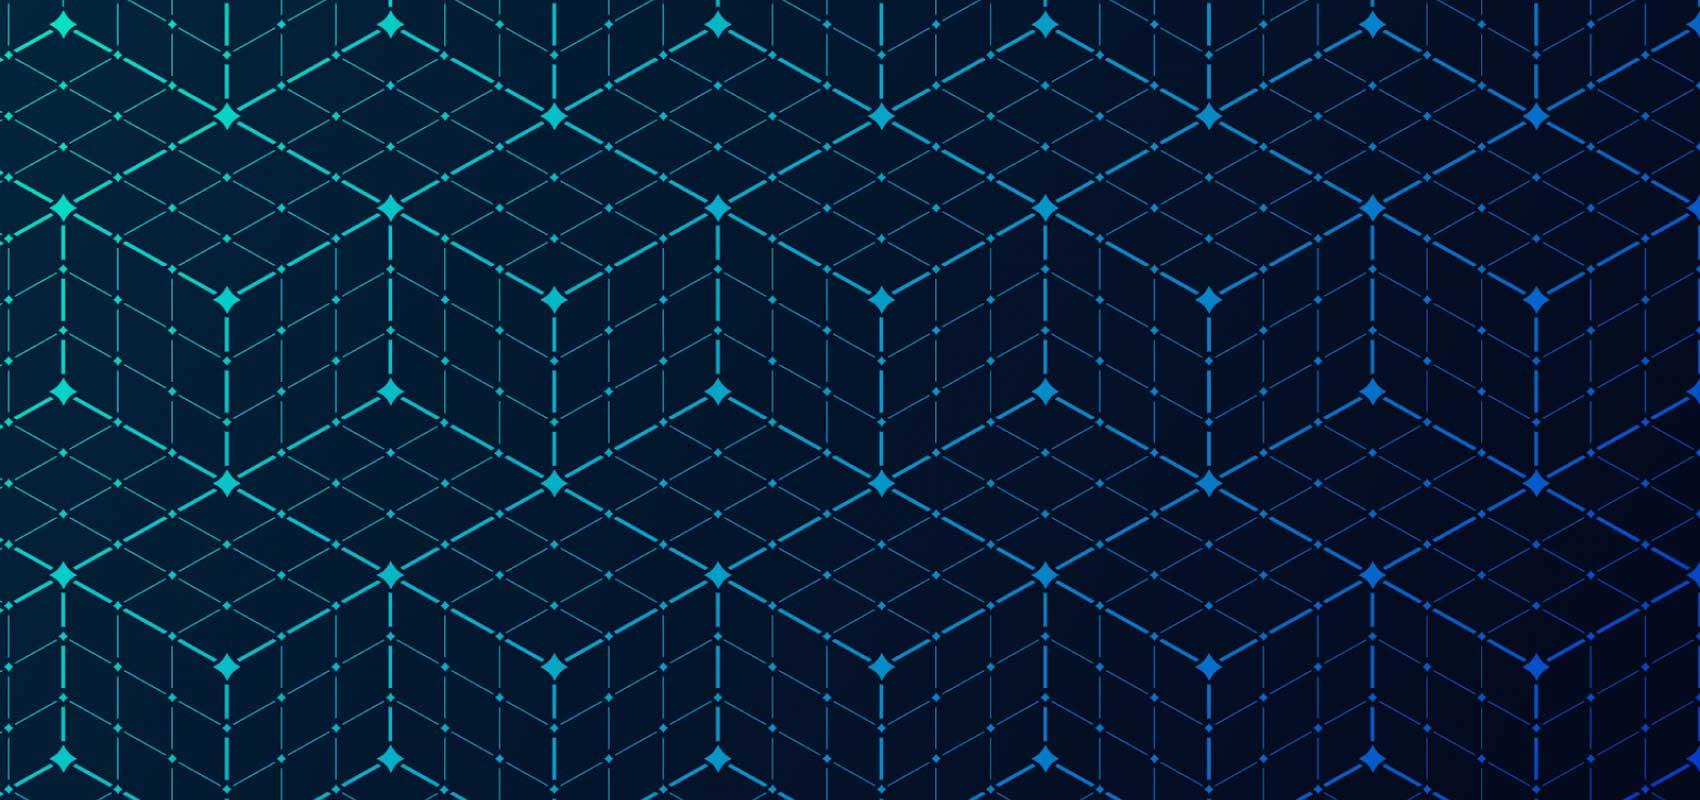 Webitcoin: Projeto educativo lança eBook gratuito sobre blockchain